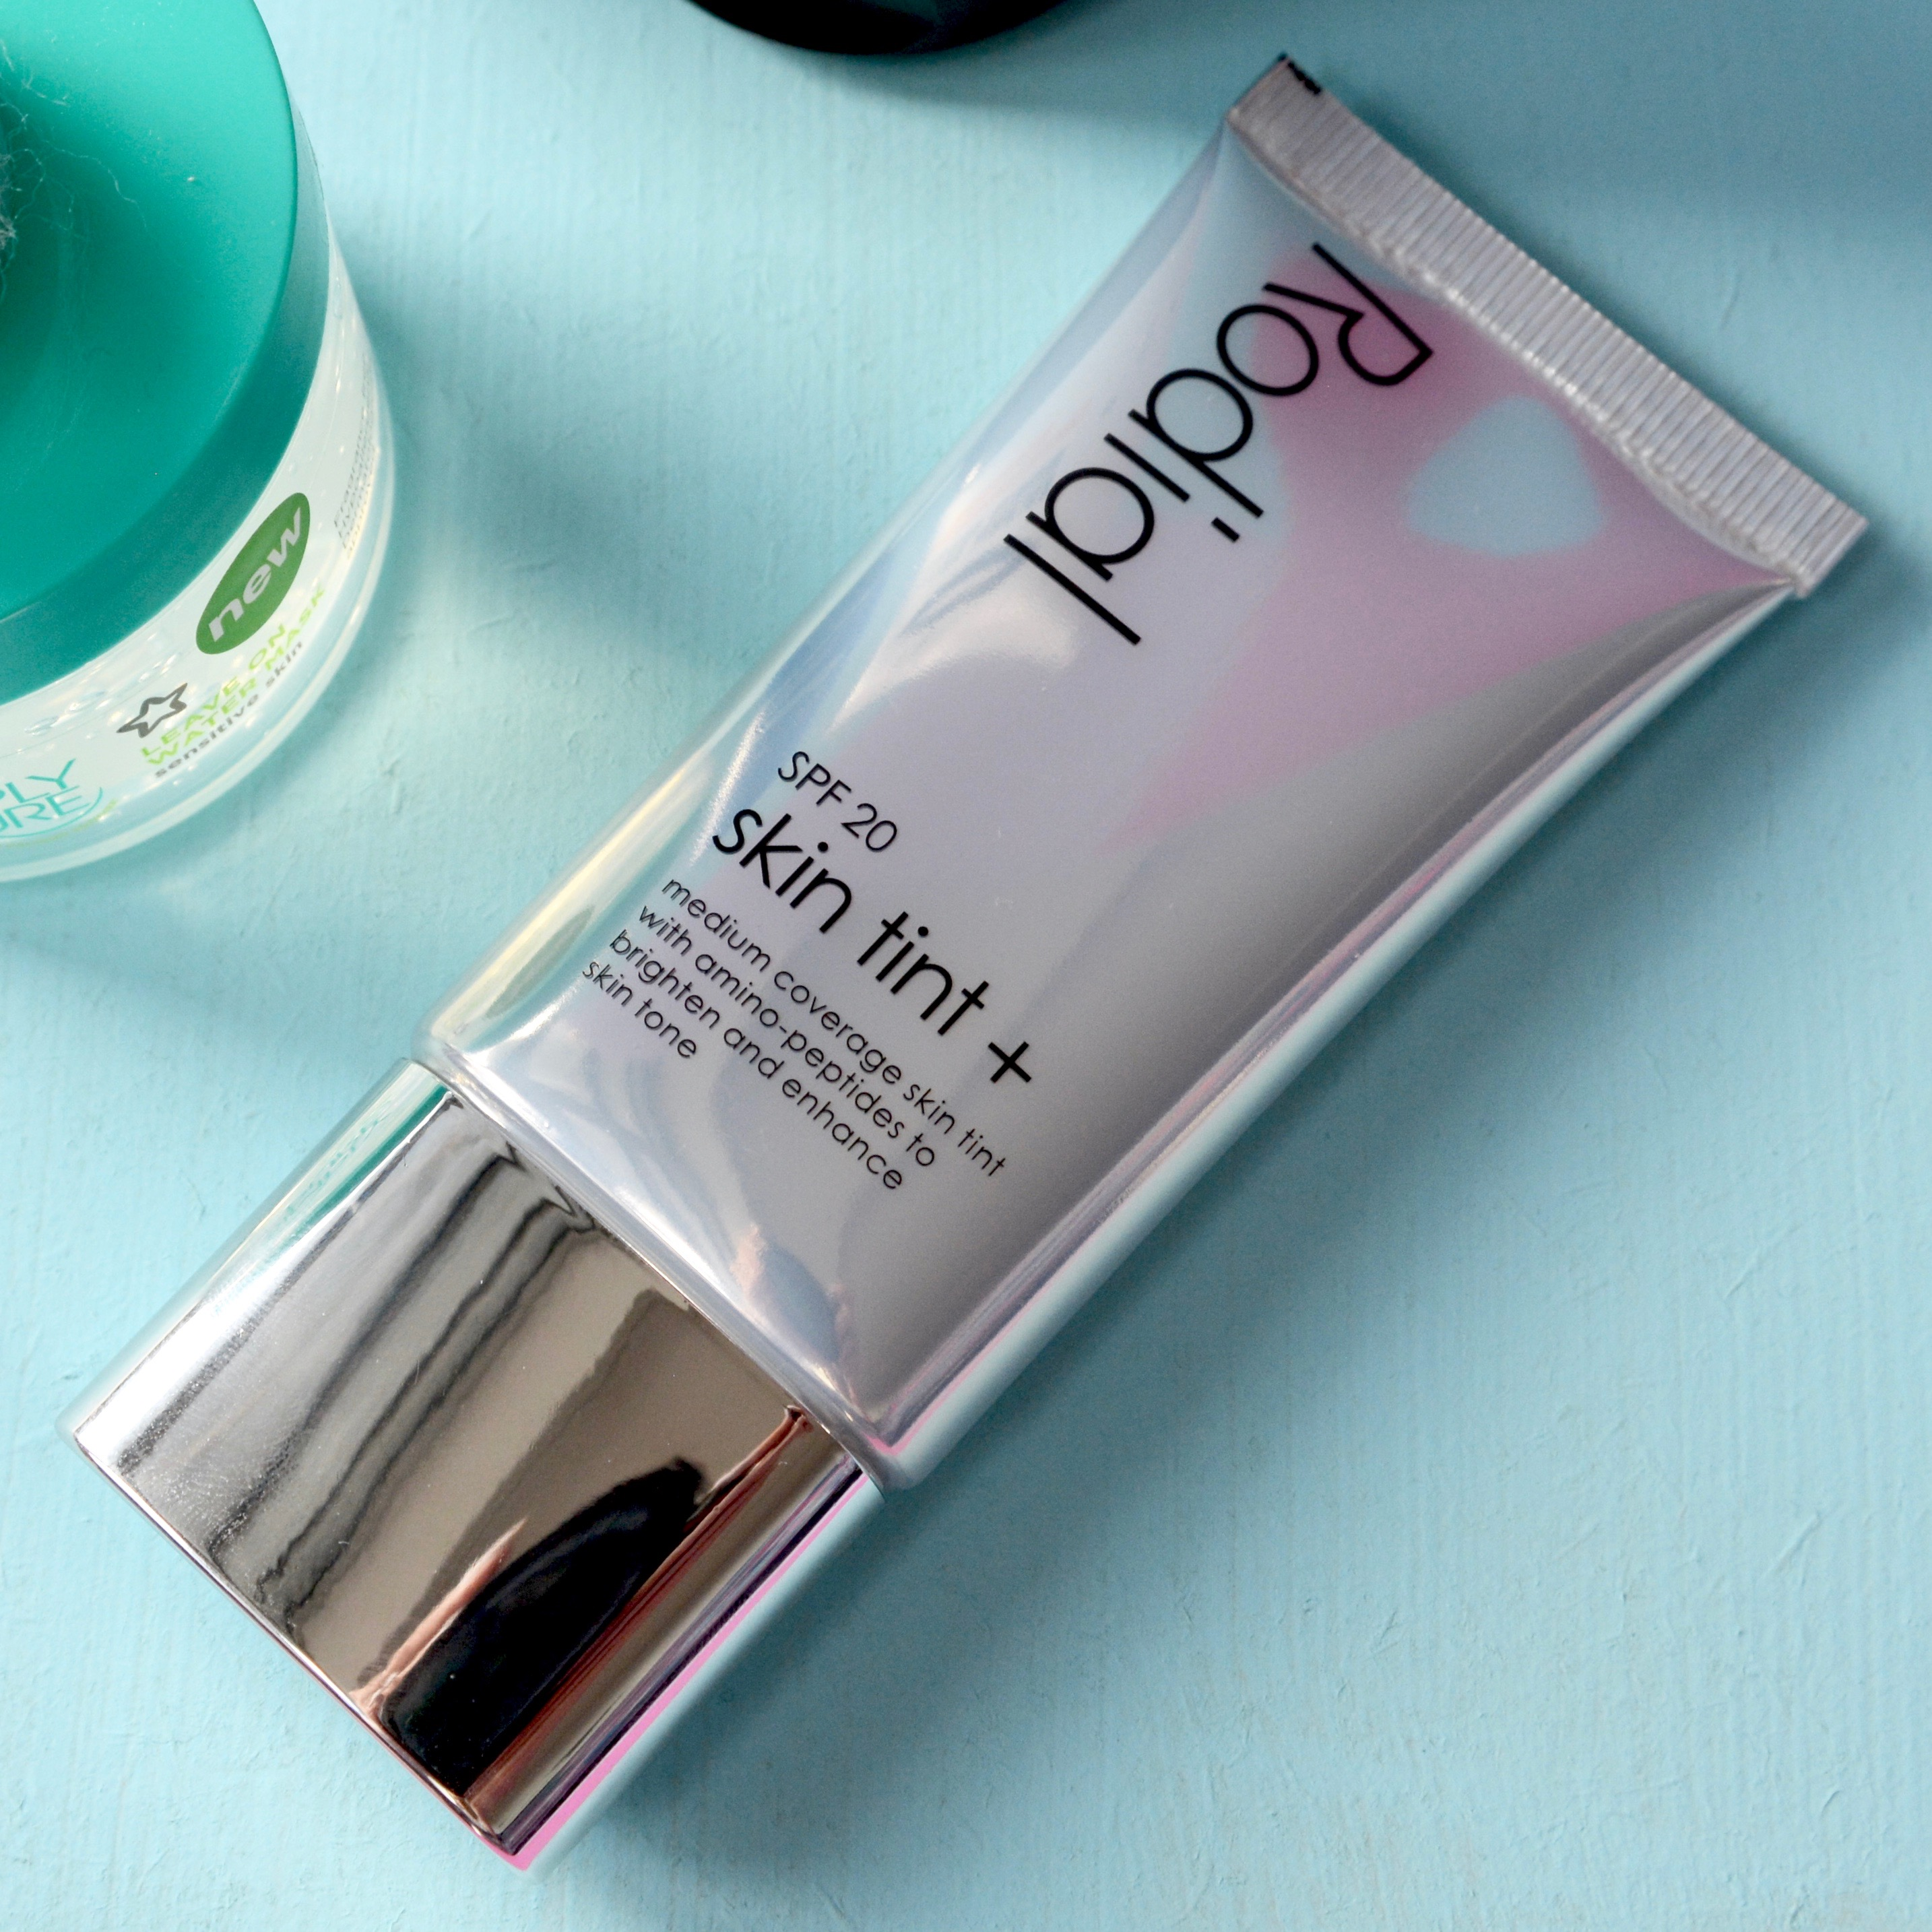 Friday Faves: Rodial Skin Tint